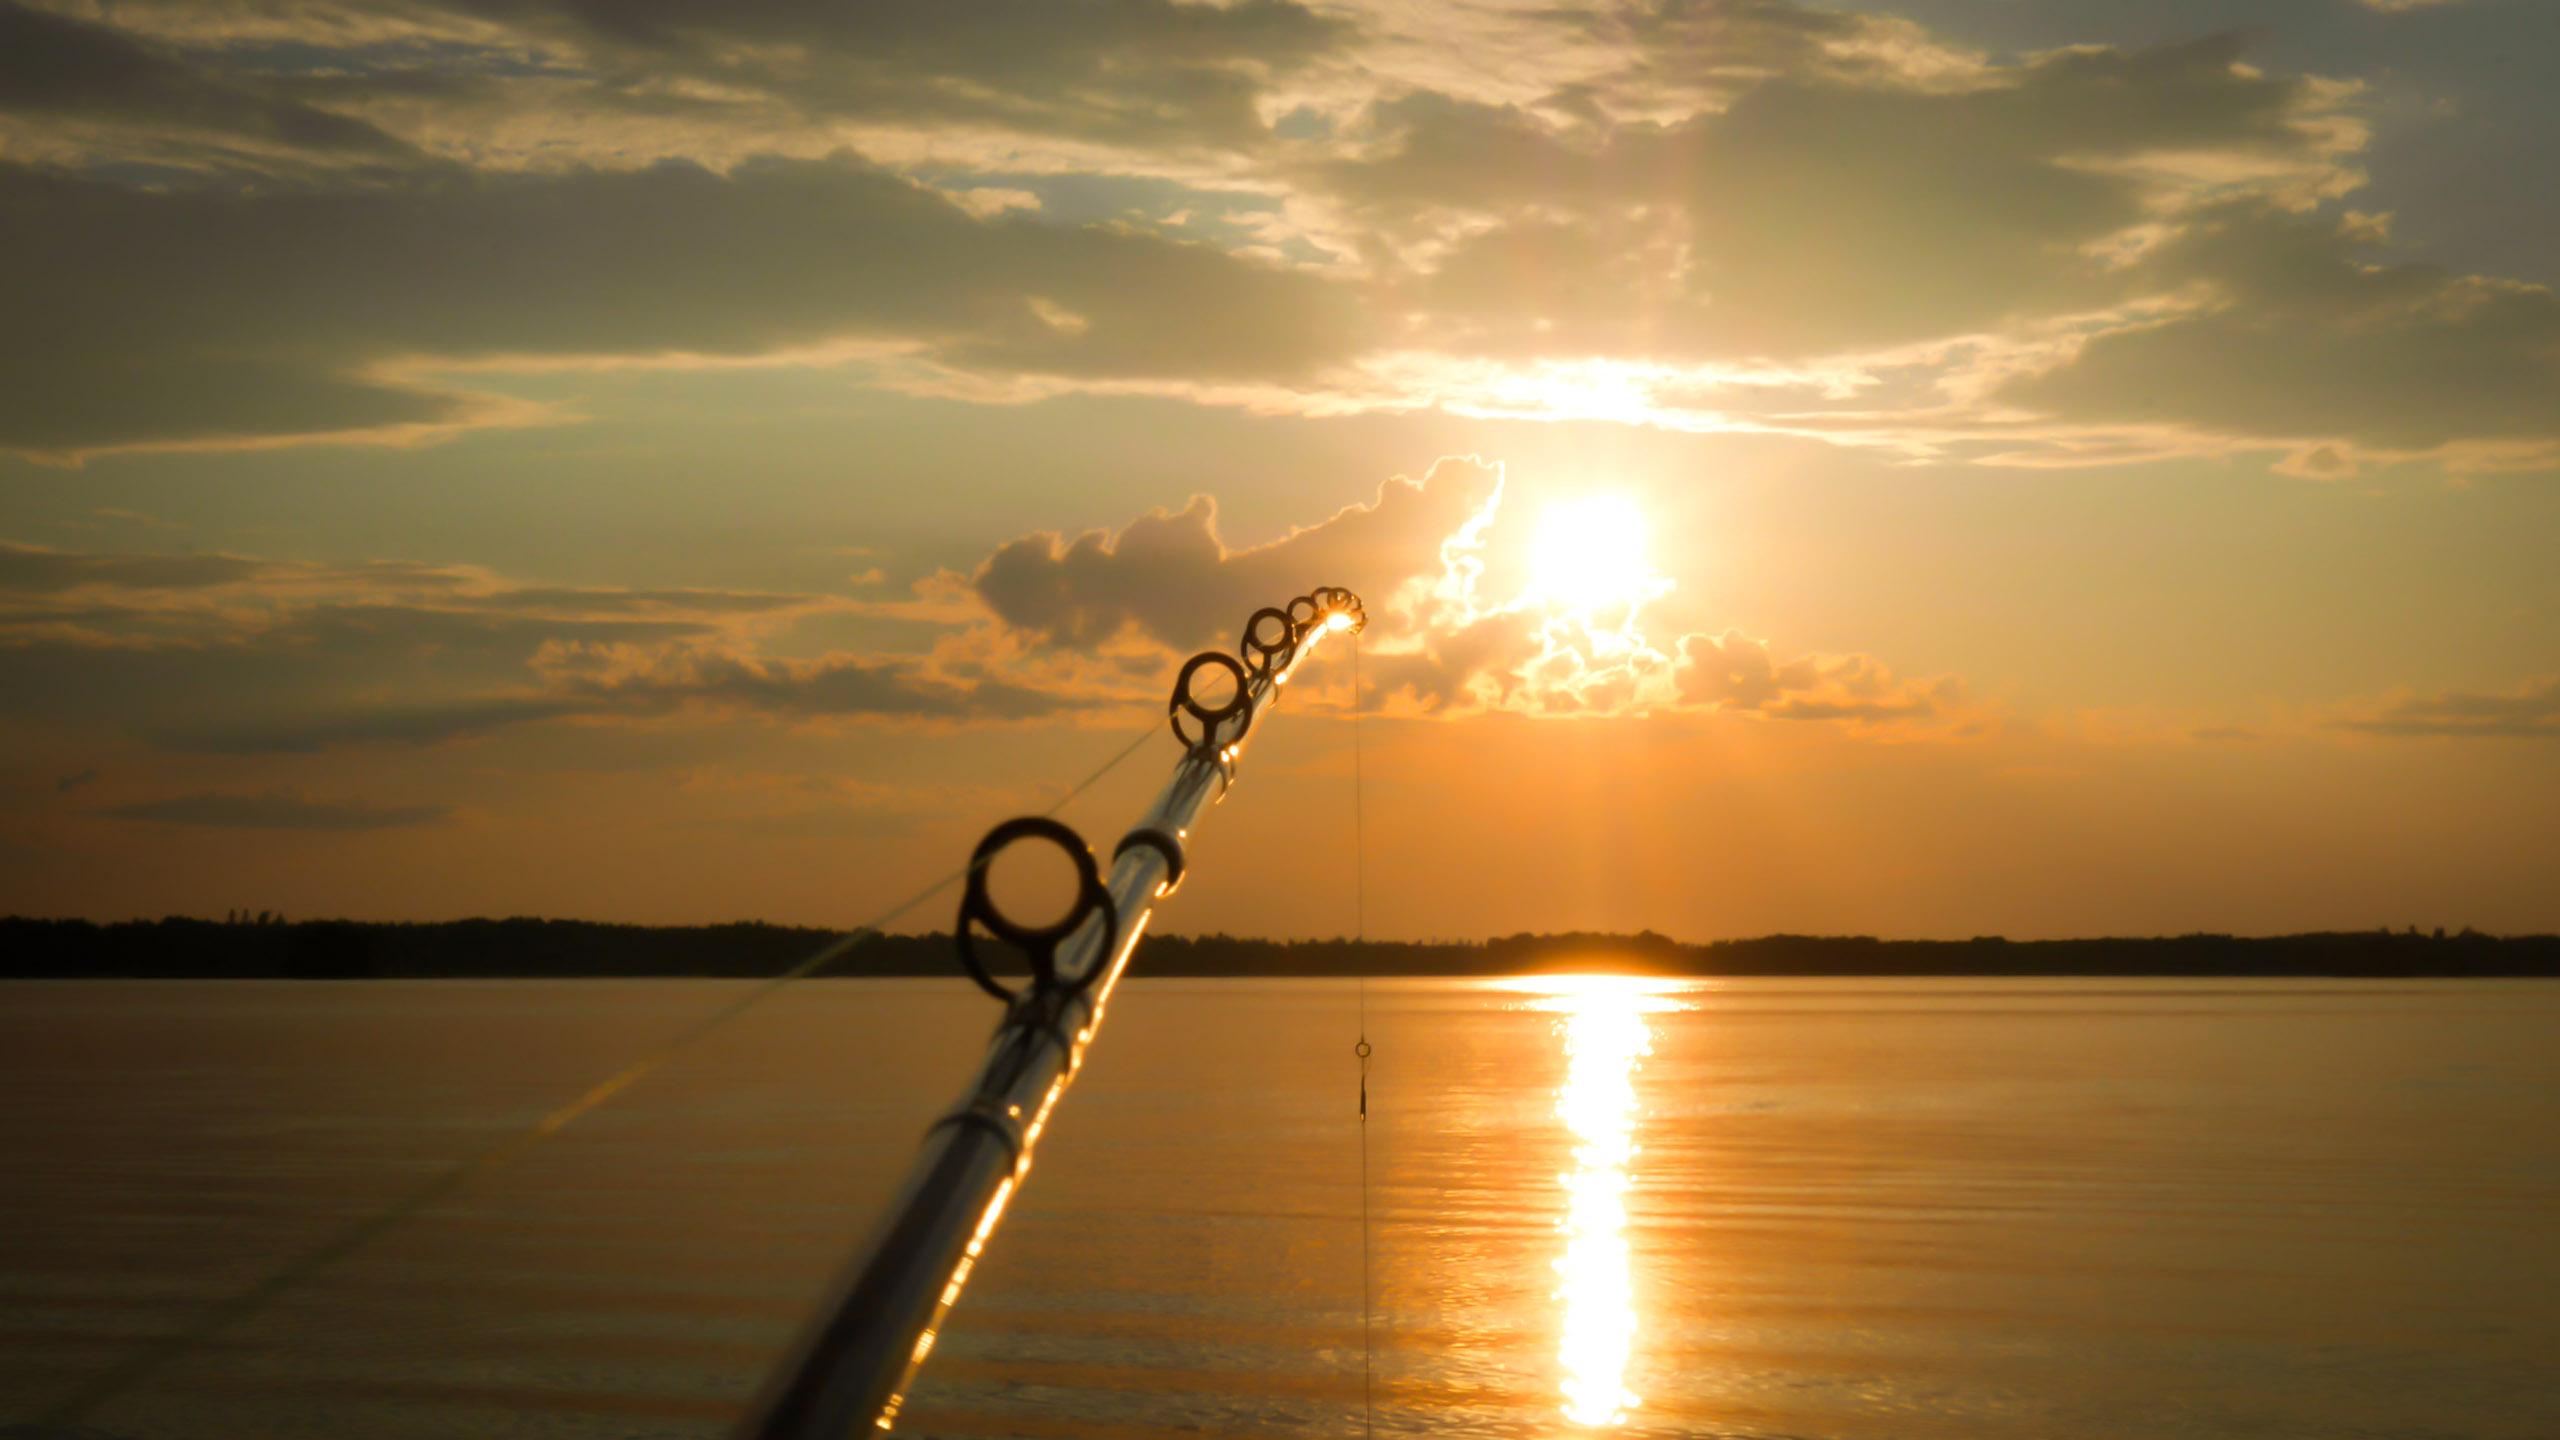 PG Fishing Guide Kalastuspalvelut